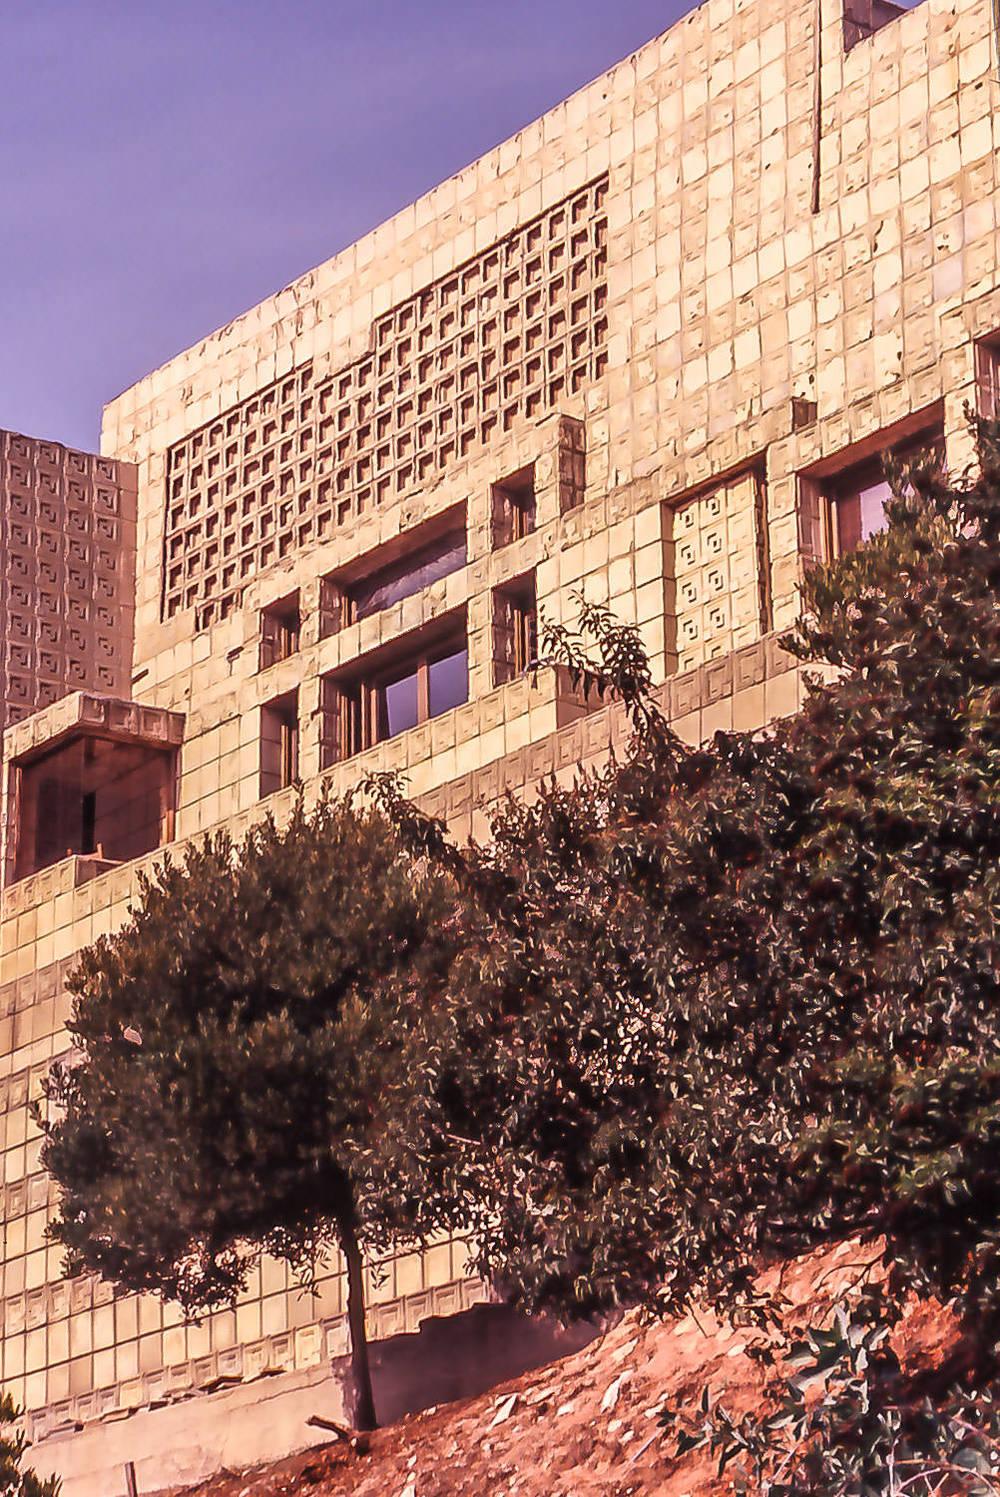 Ennis House, Los Angeles, California